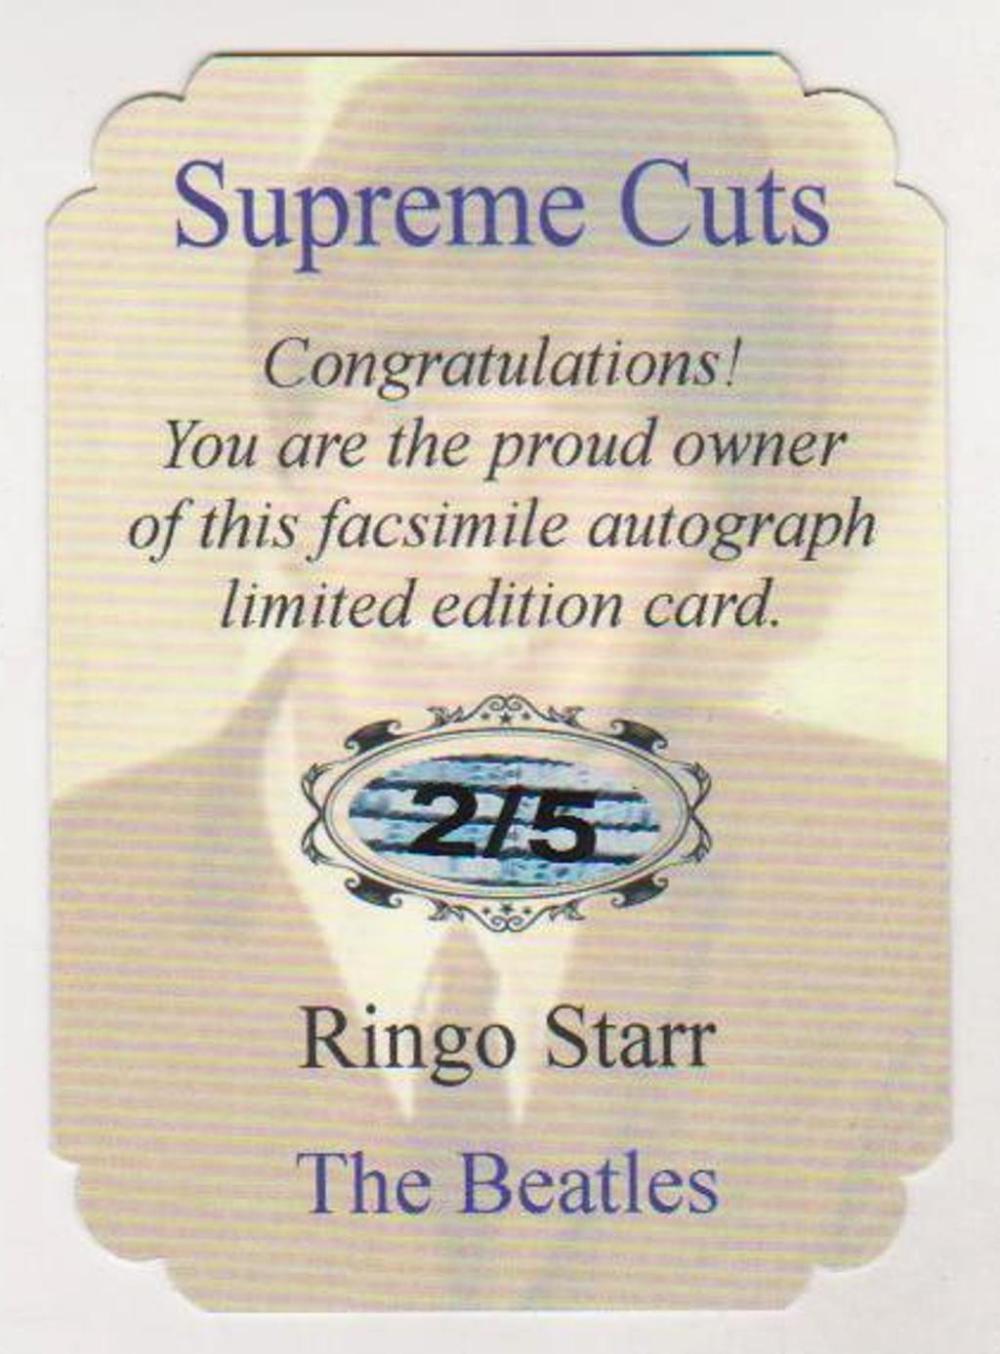 Lot 4: #2/5 Produced - Ringo Starr Facsimile Autograph Special Supreme Cuts Die Cut Limited Edition Card